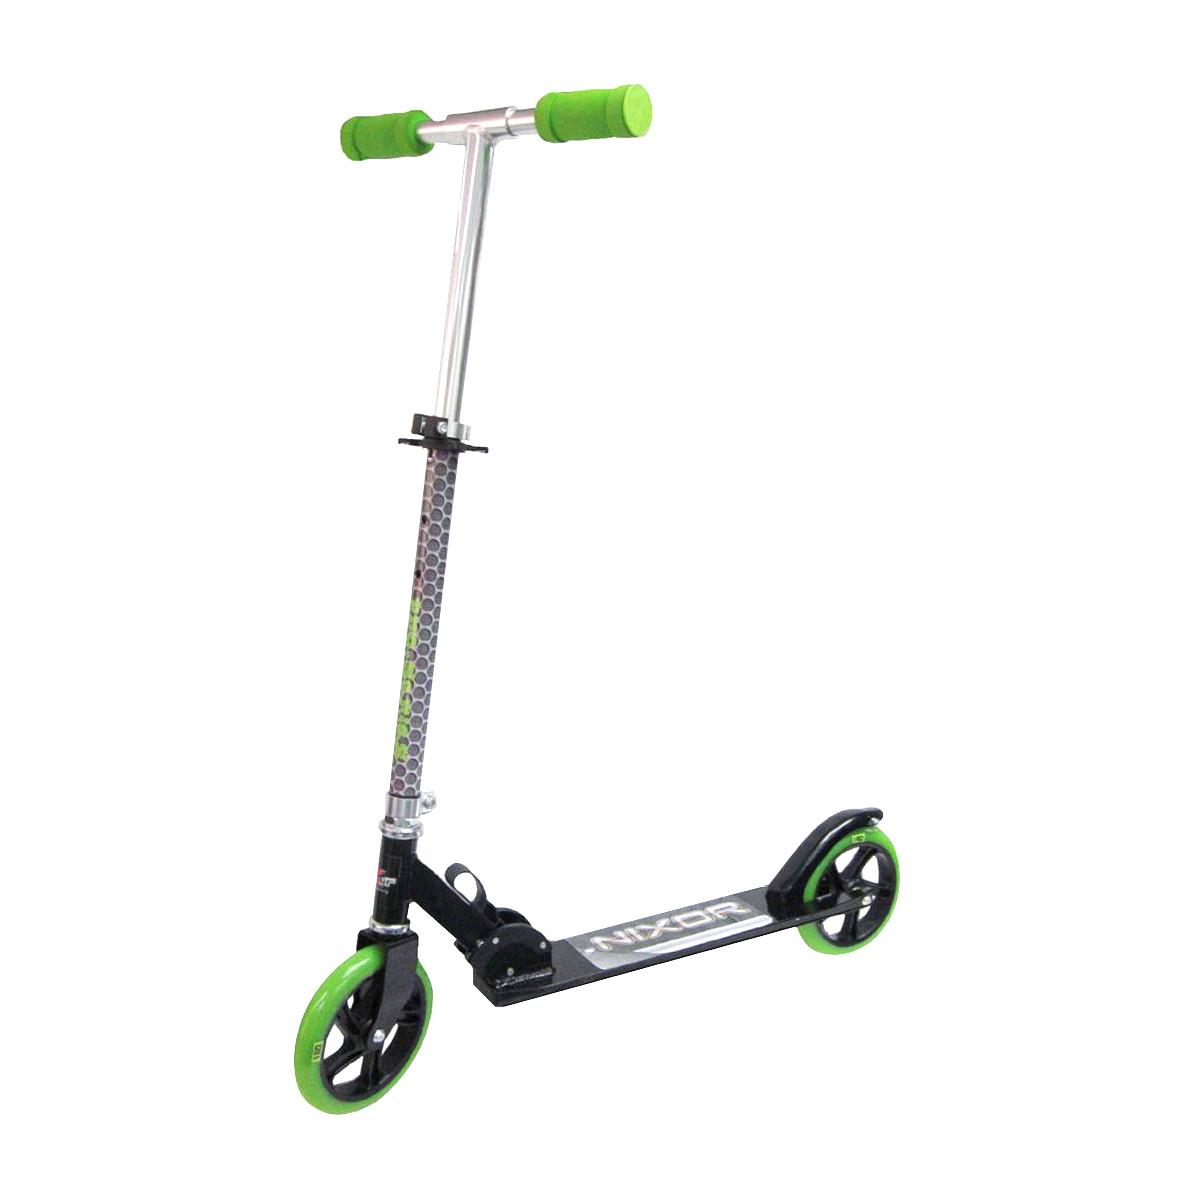 Скутер серии - PROFESSIONAL 180 (алюмин., 2 колеса, груз. до 100 кг), NA 01081